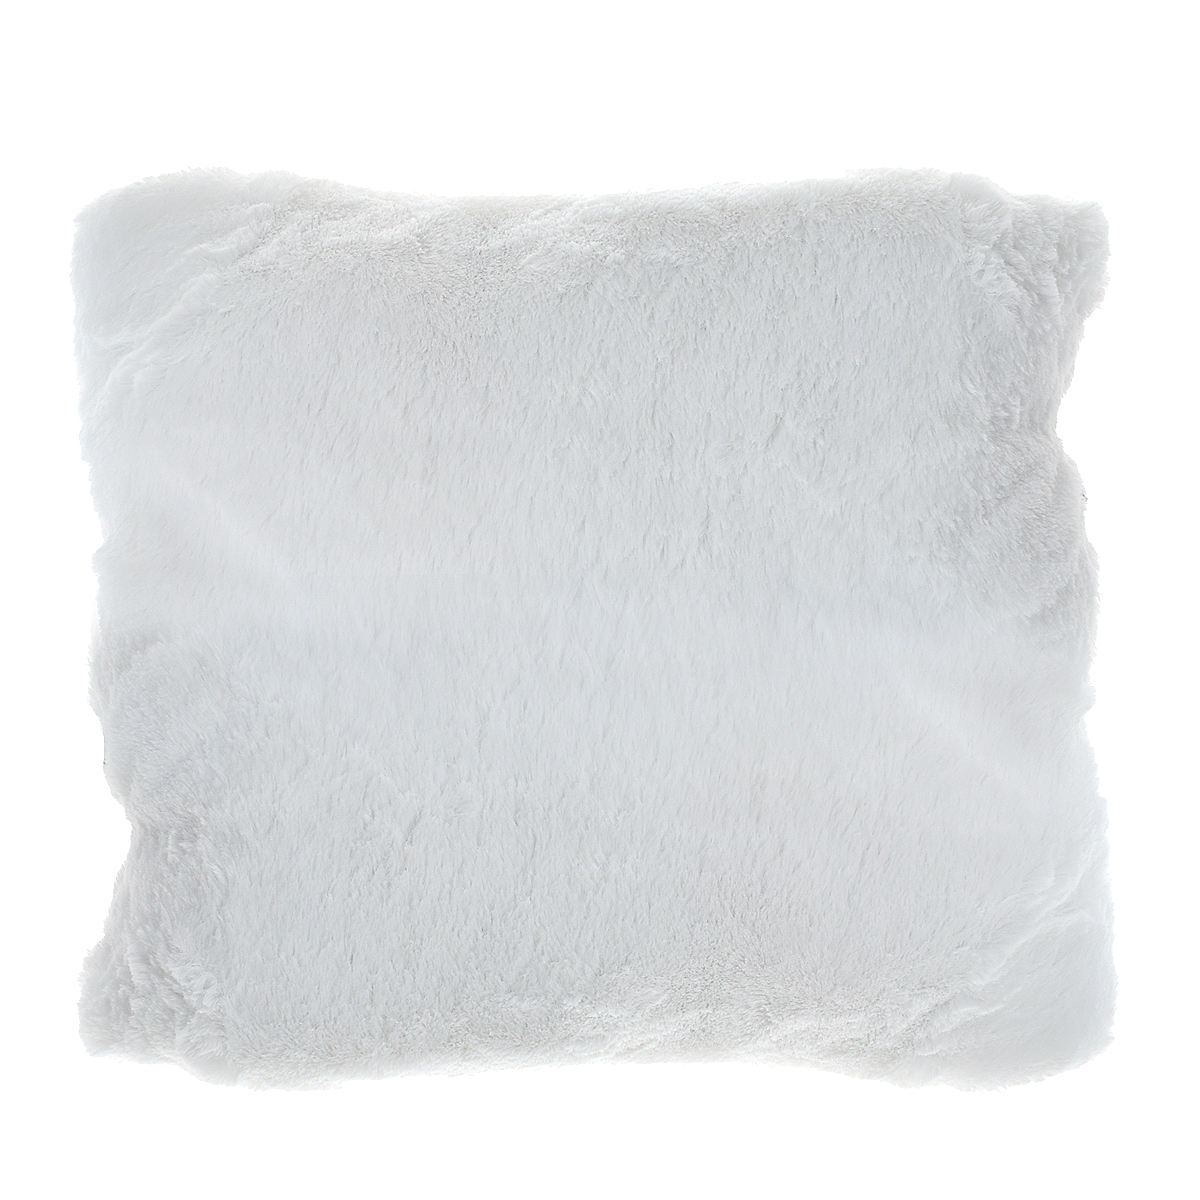 Подушка декоративная со светодиодами Bradex Млечный путь, 38 см х 38 смTD 0235